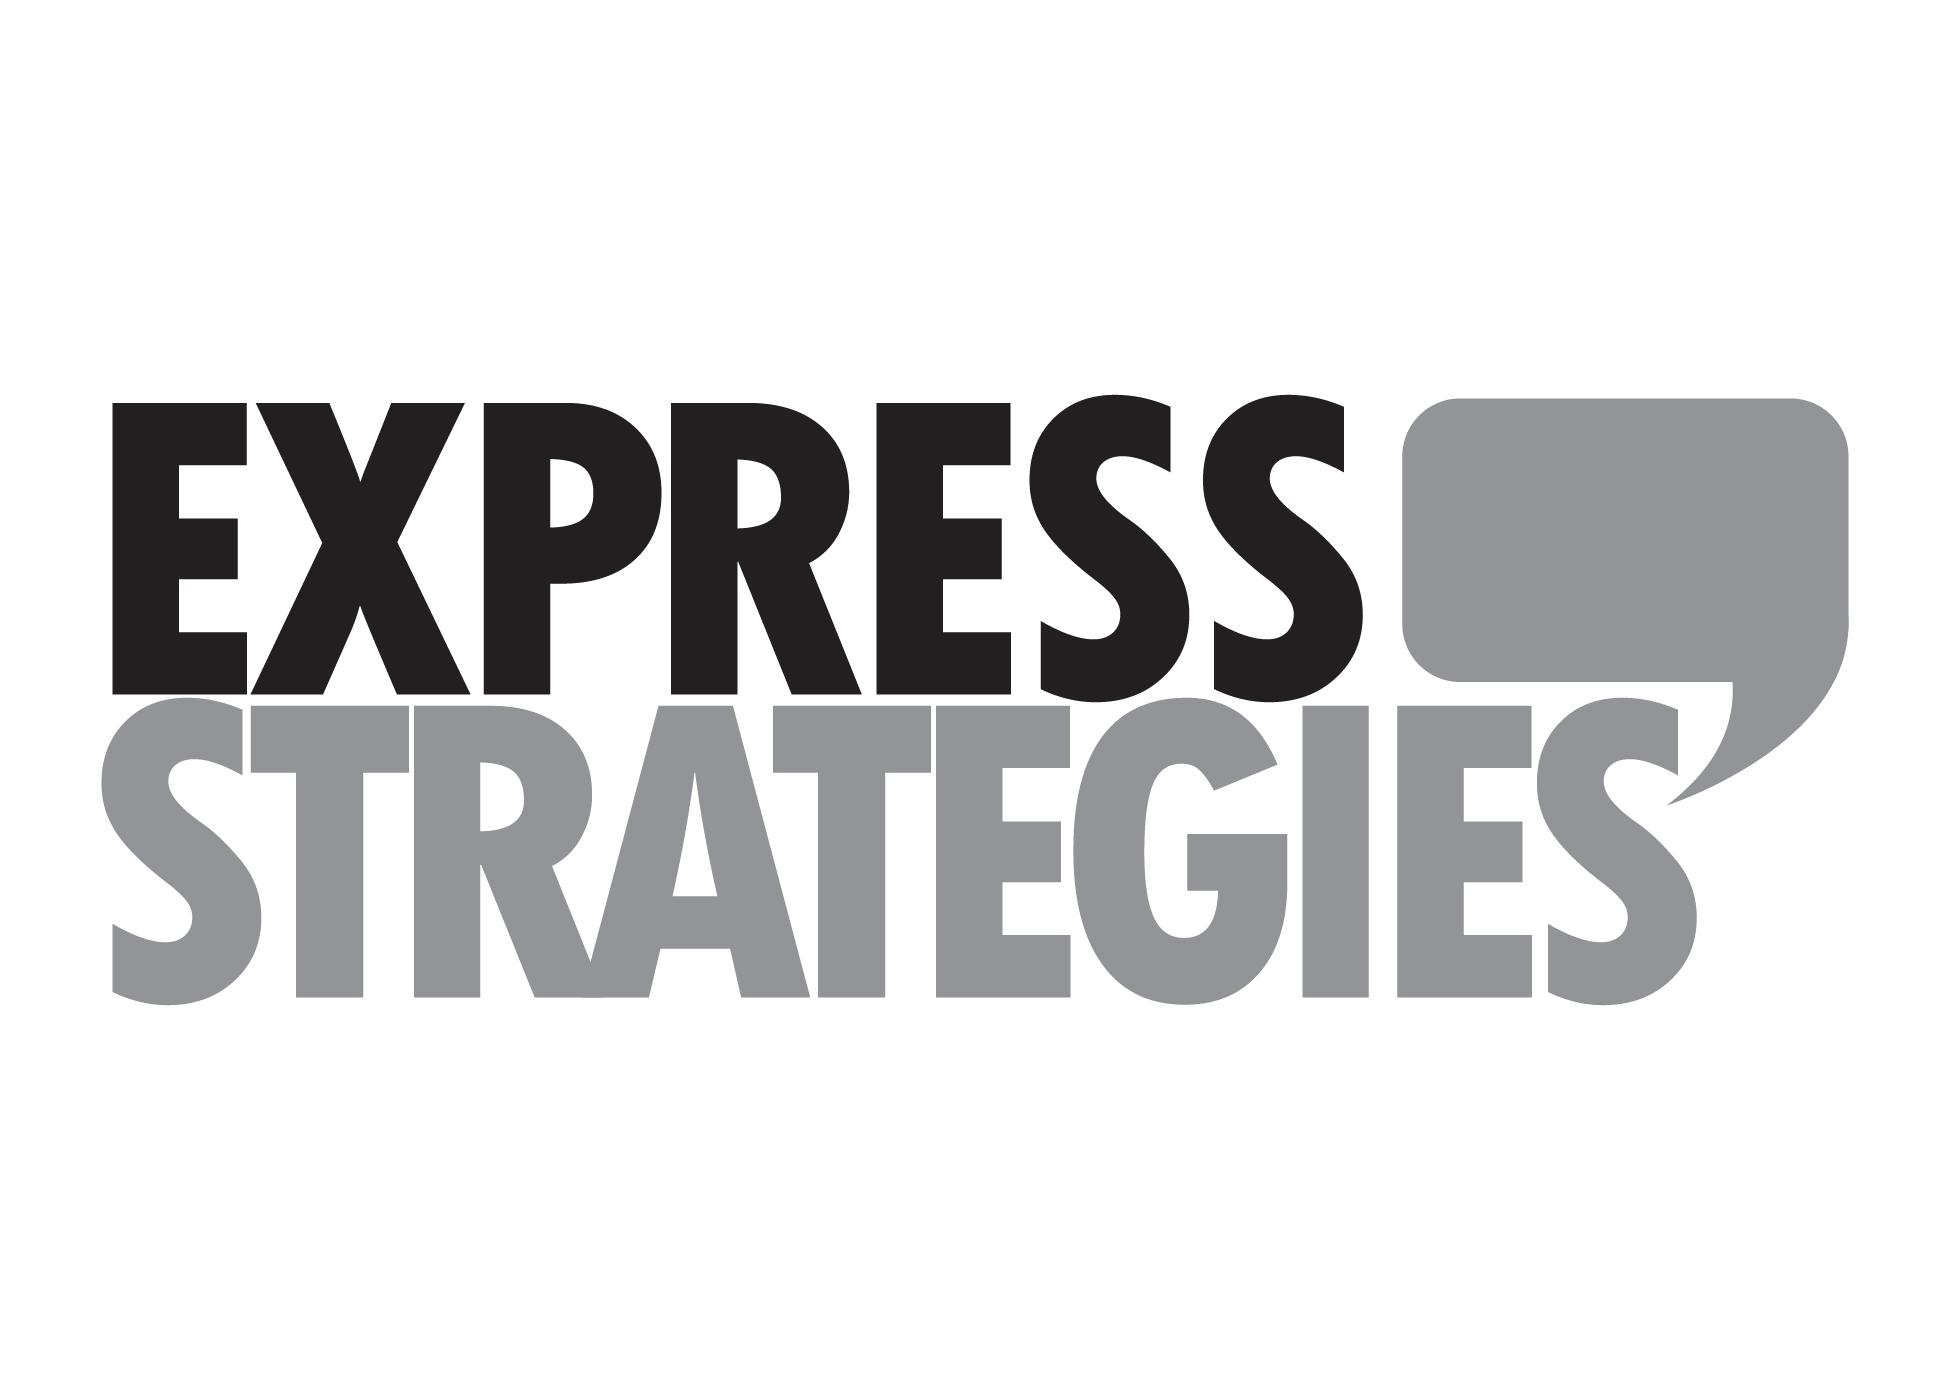 Express Strategies.jpg